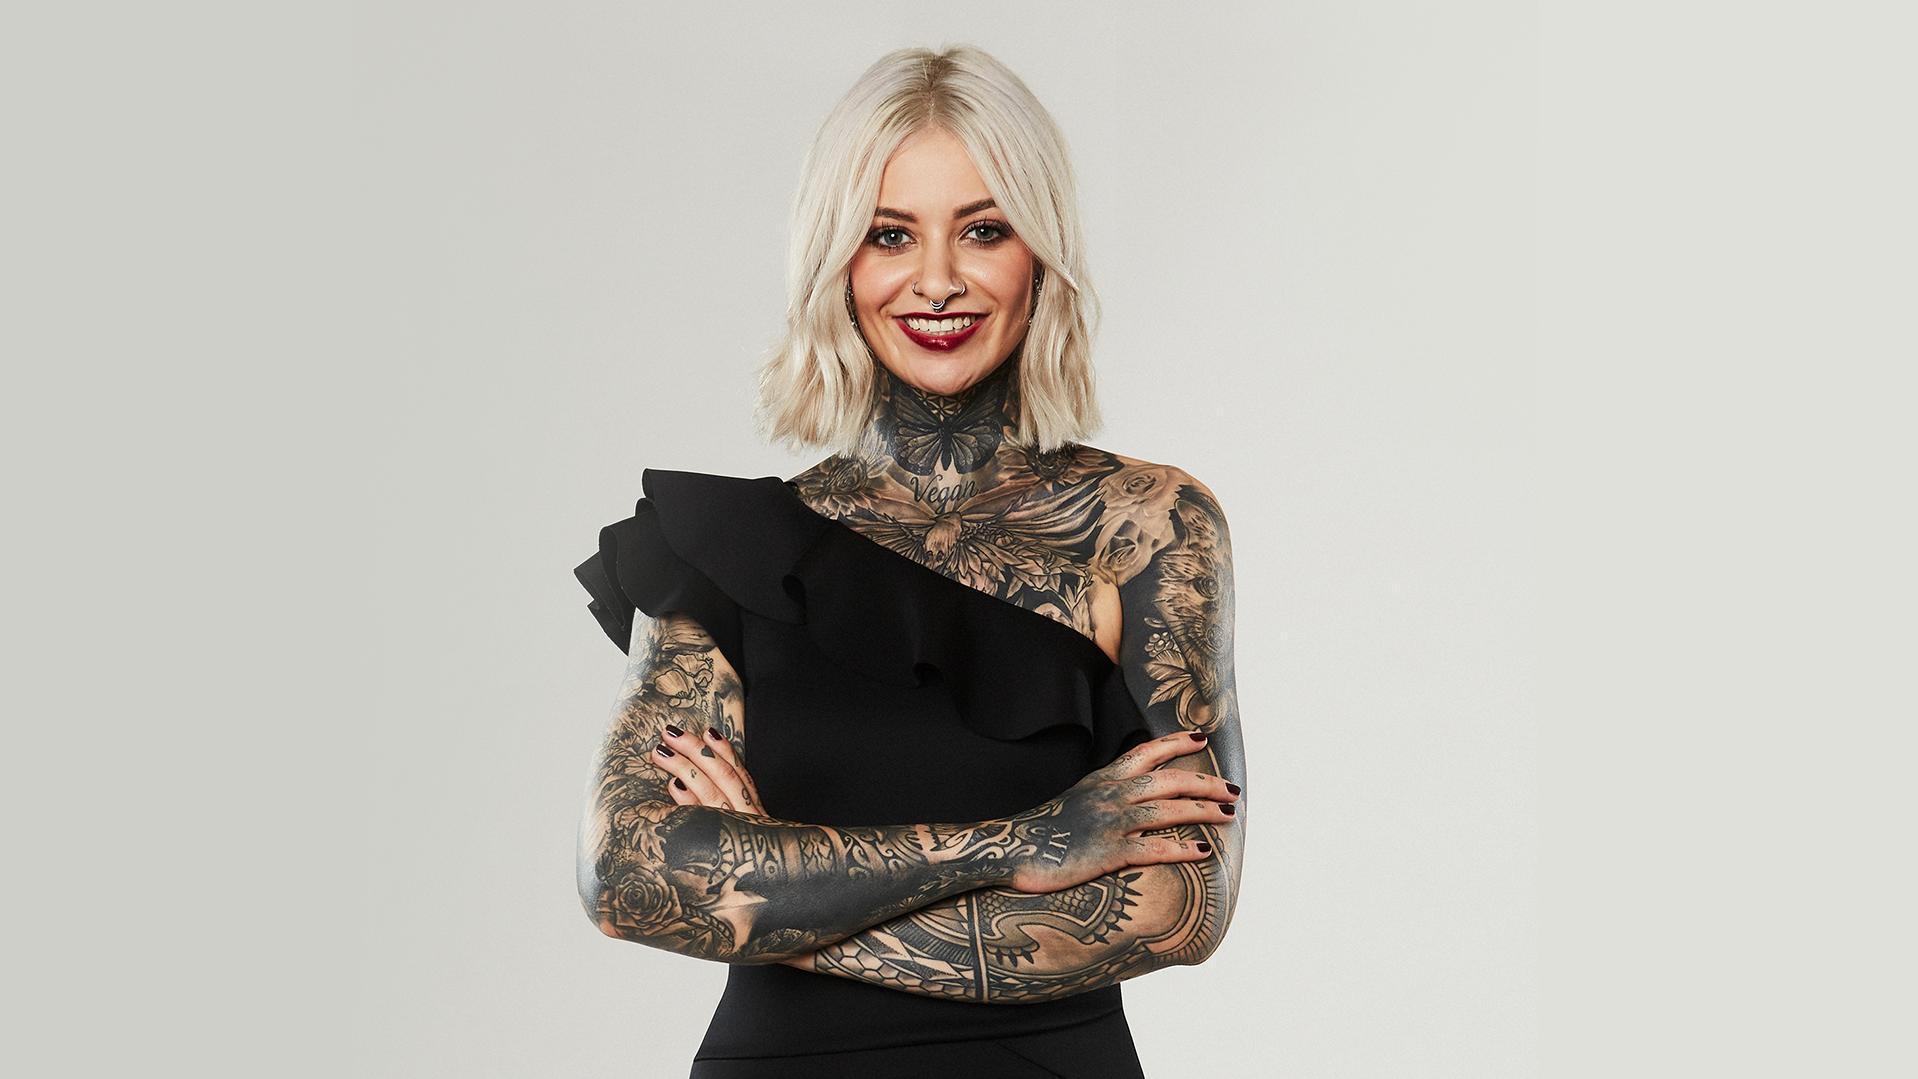 Tattoo singles baden wurttemberg